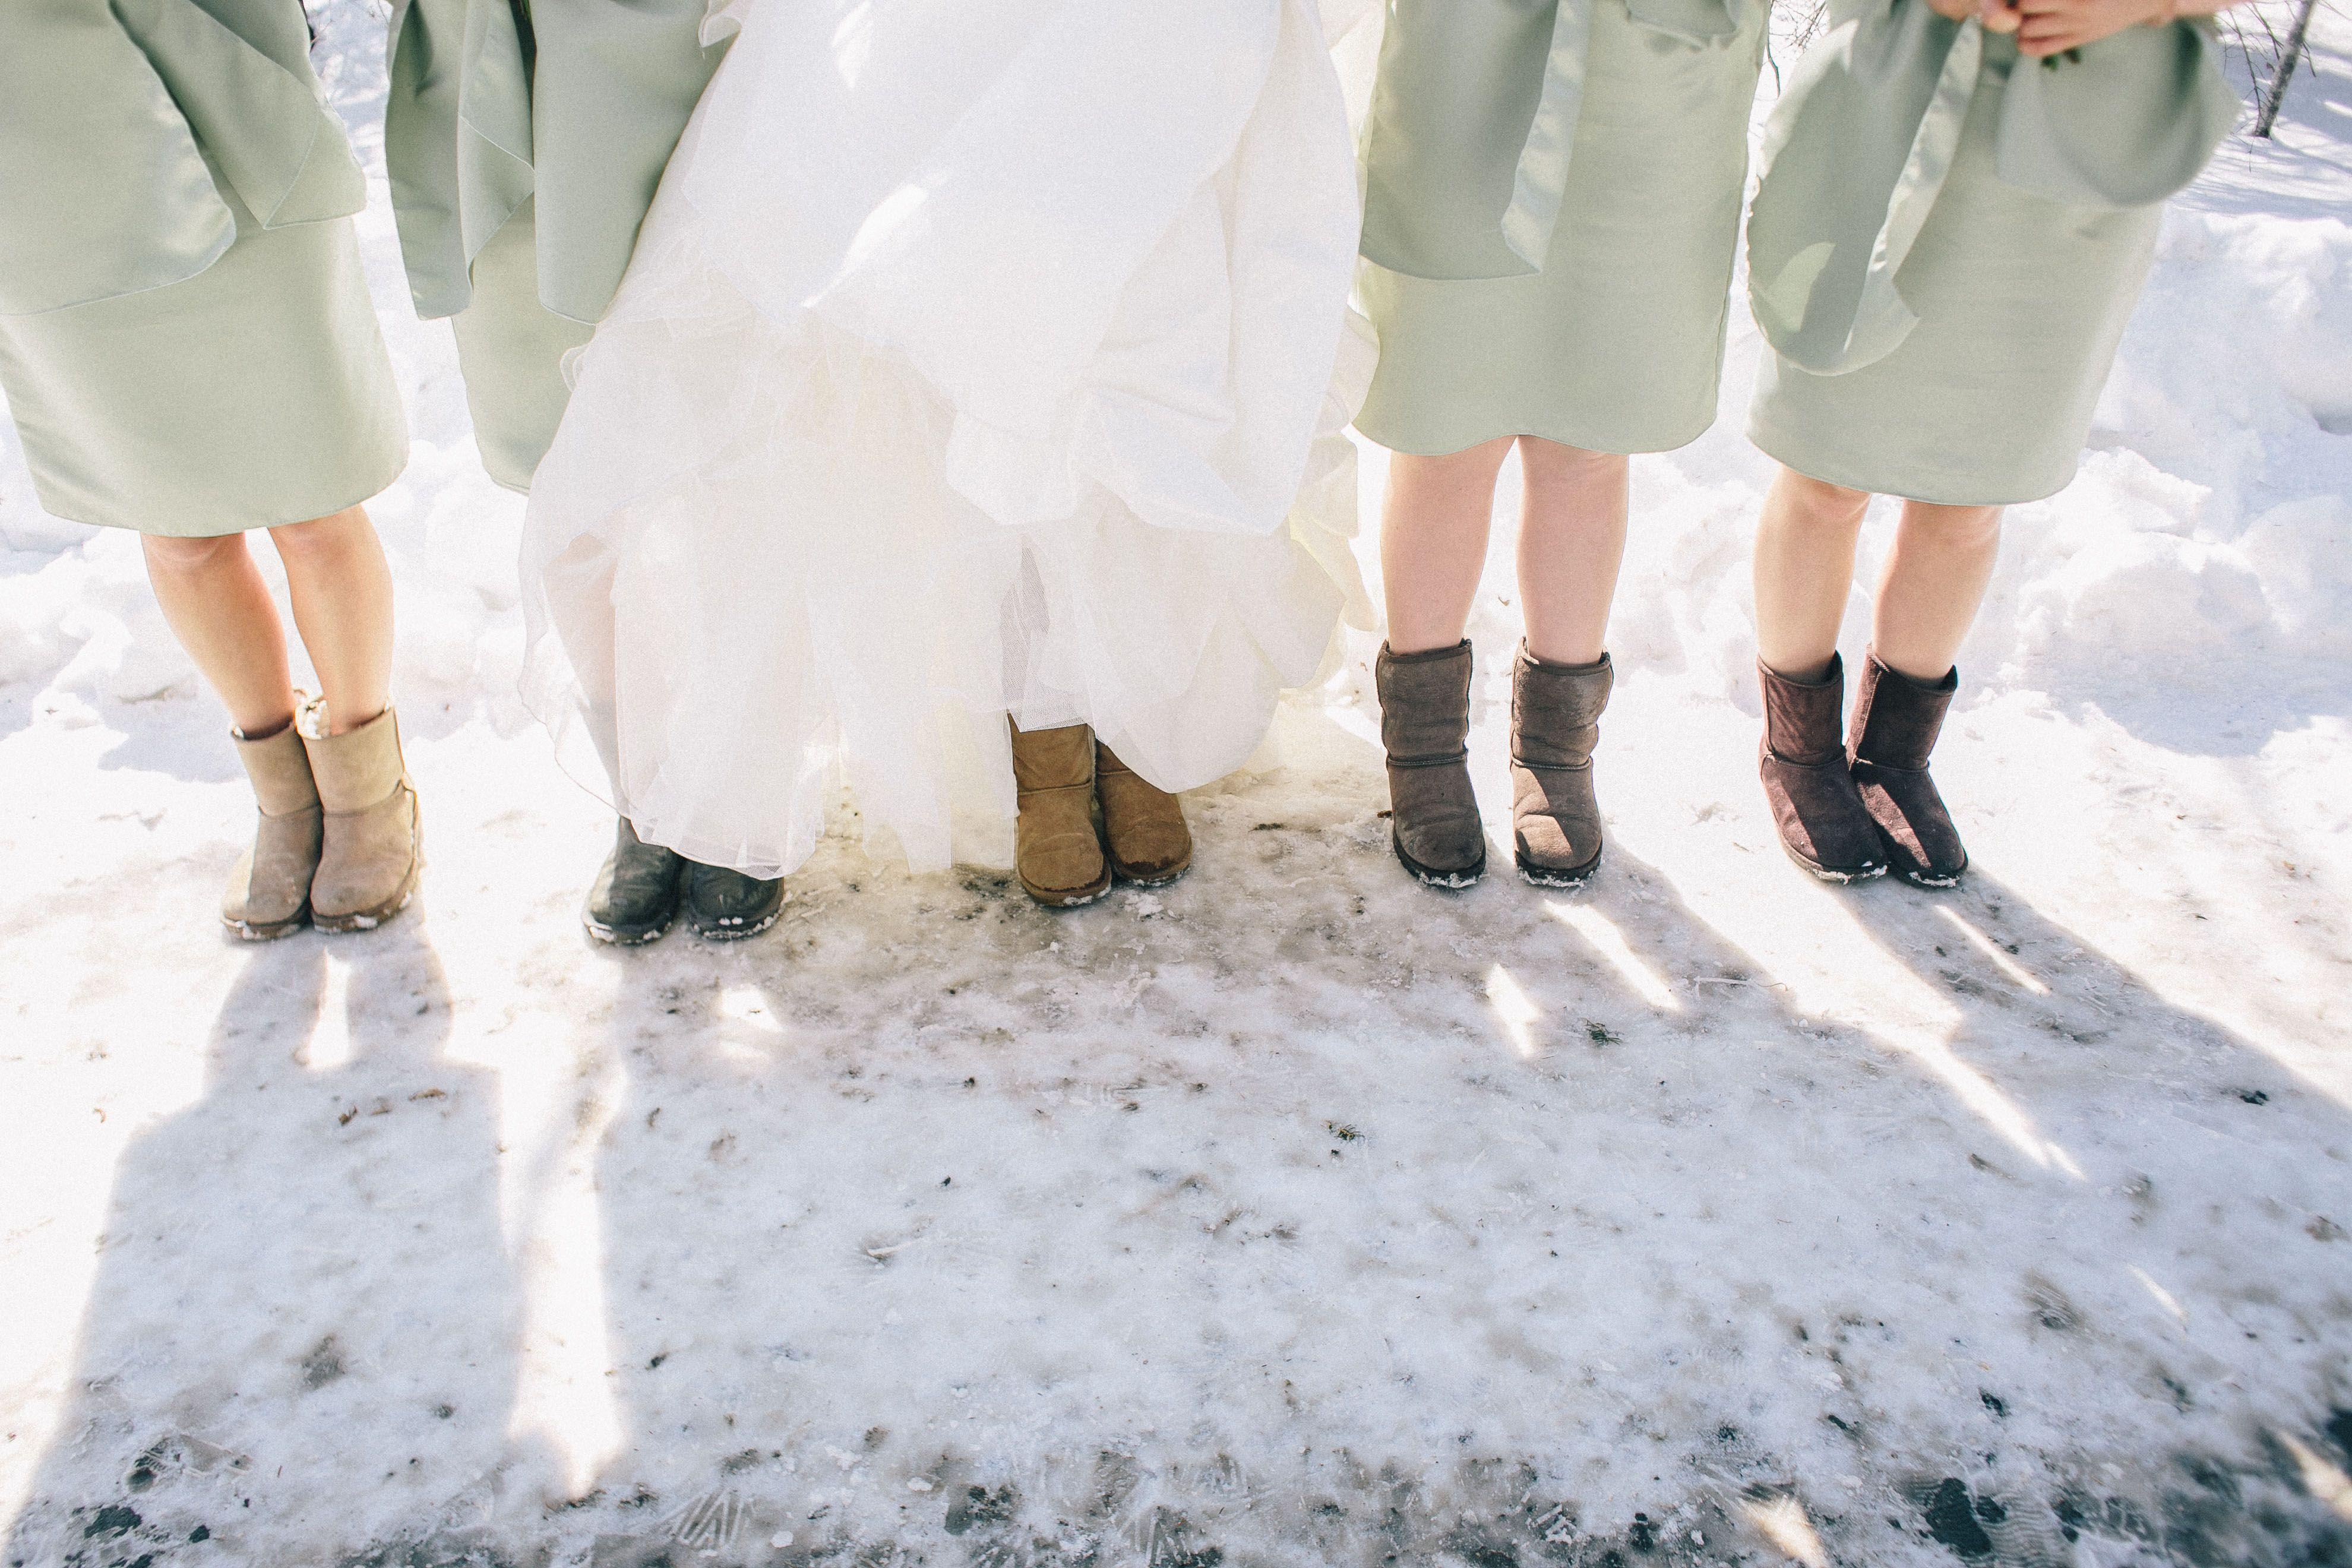 e48458a924  wedding  photography  white  dress  winter  flower  winter  bride   bridesmaids  Ugg  Boots  green  dresses